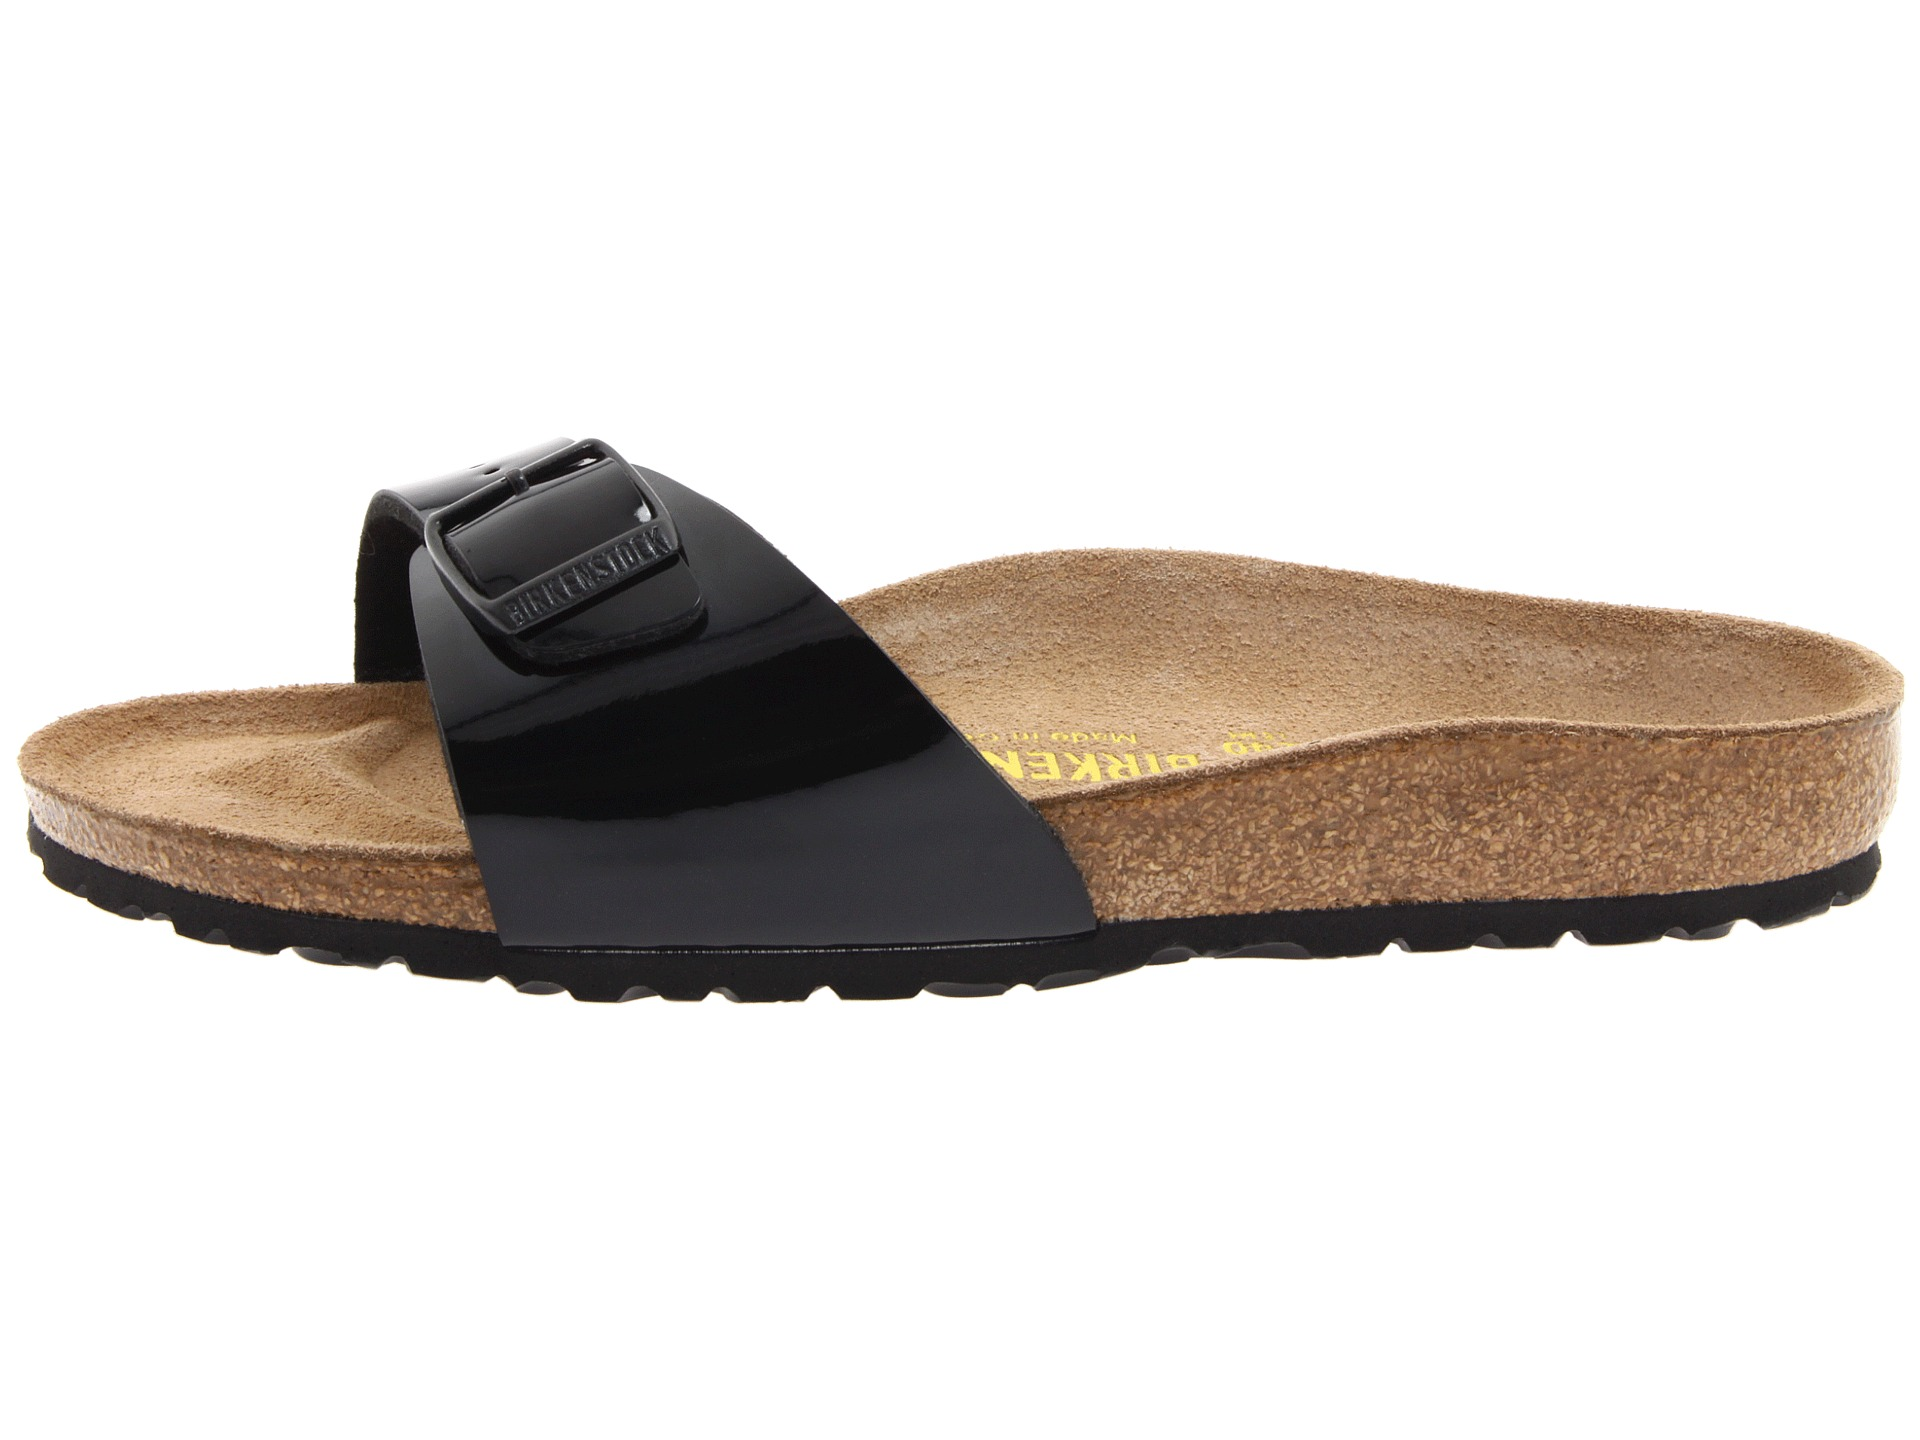 Women's sandals that hide bunions - Video